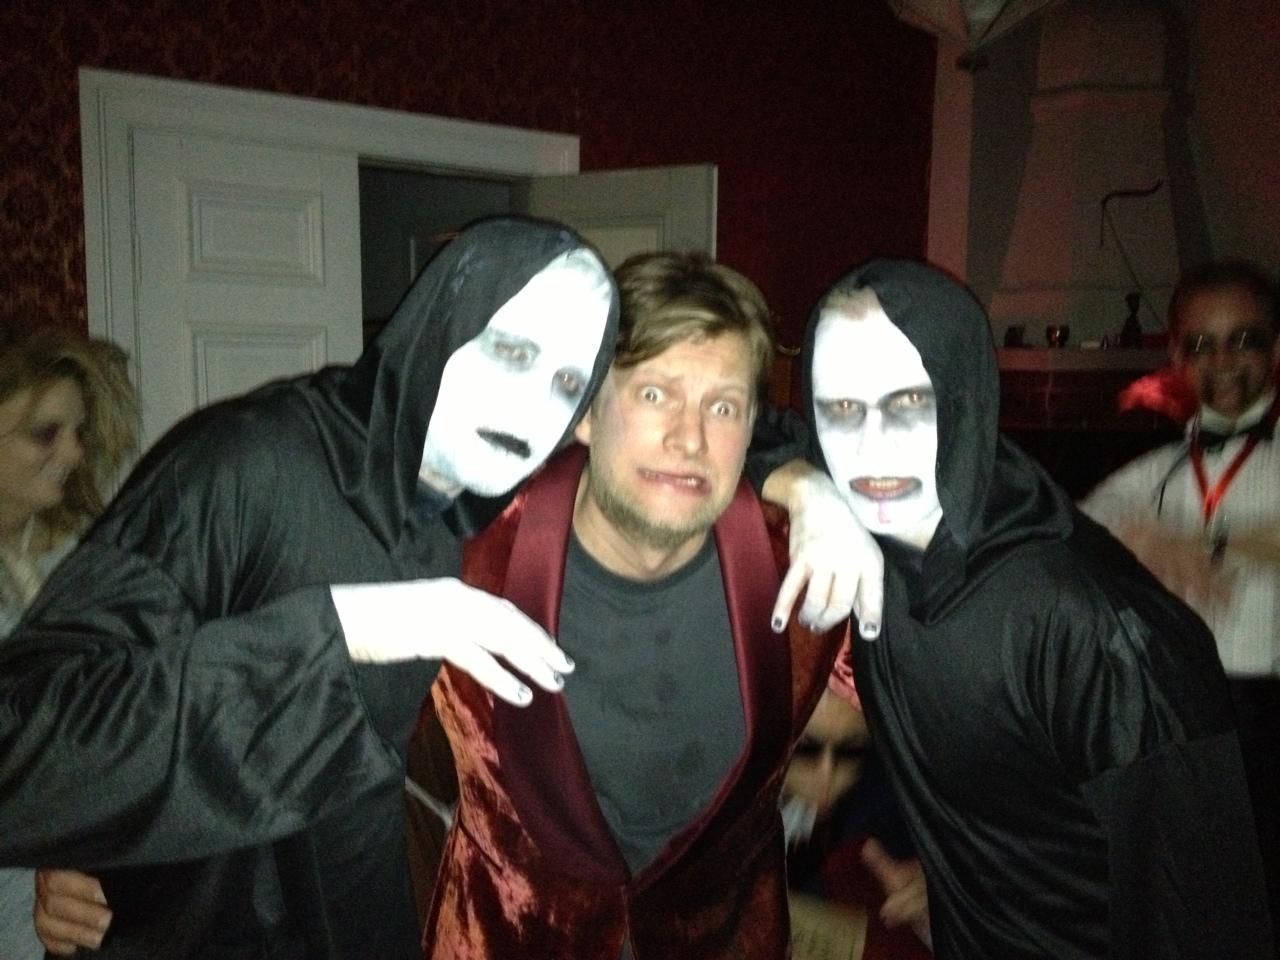 Kusliga bilder från Halloweenfesten. eff9943c747db